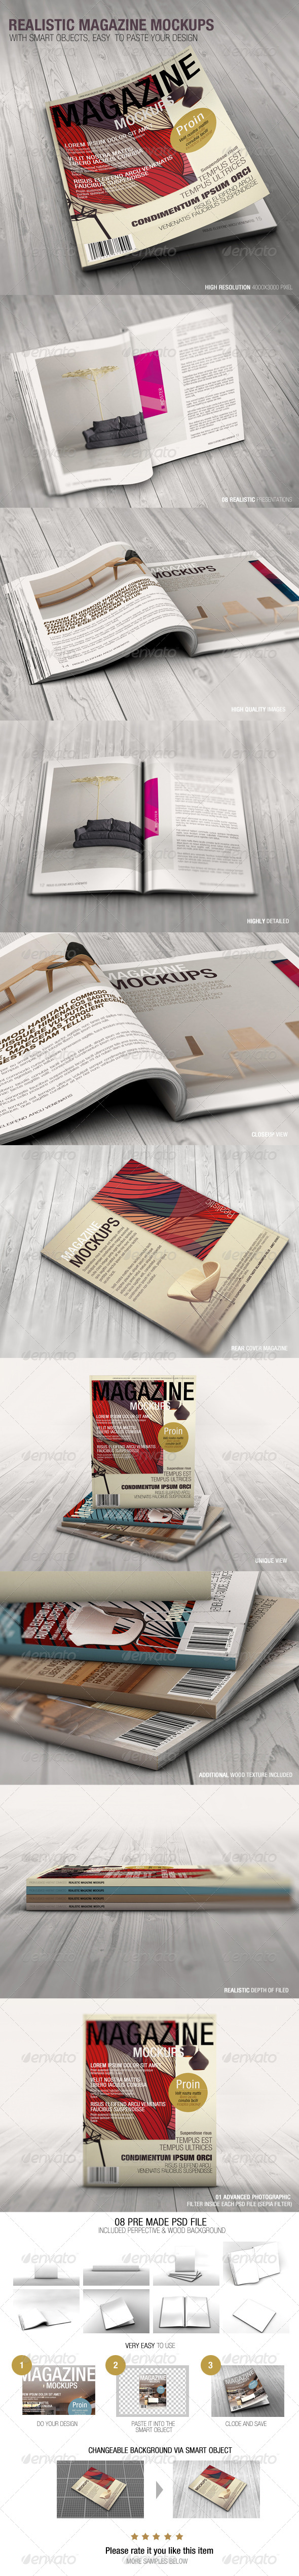 GraphicRiver Realistic Magazine Mockups 7480115